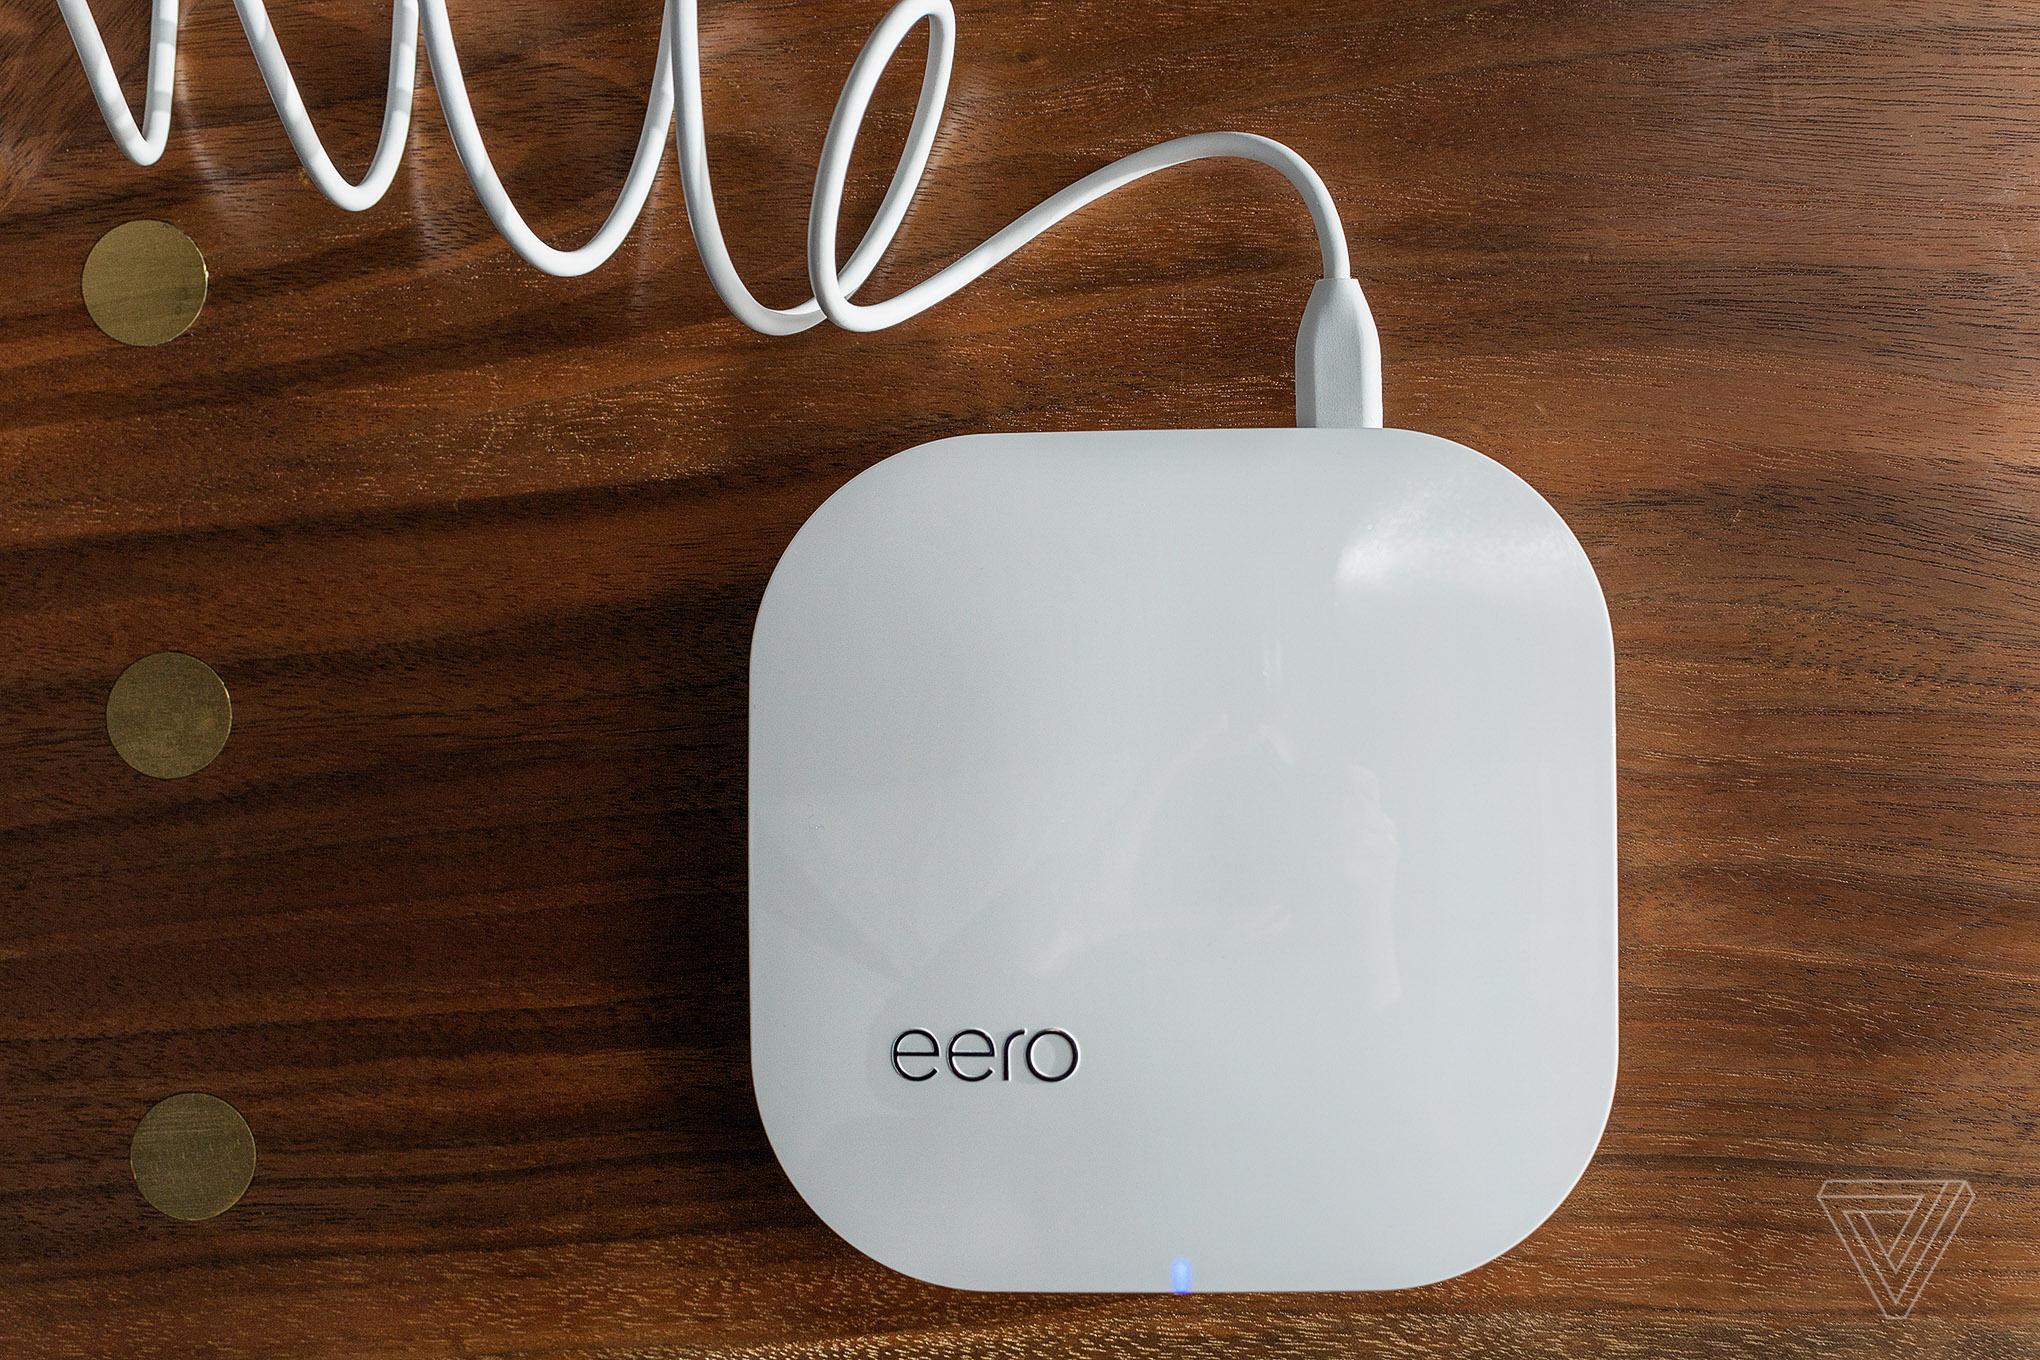 The gen 2 Eero base station